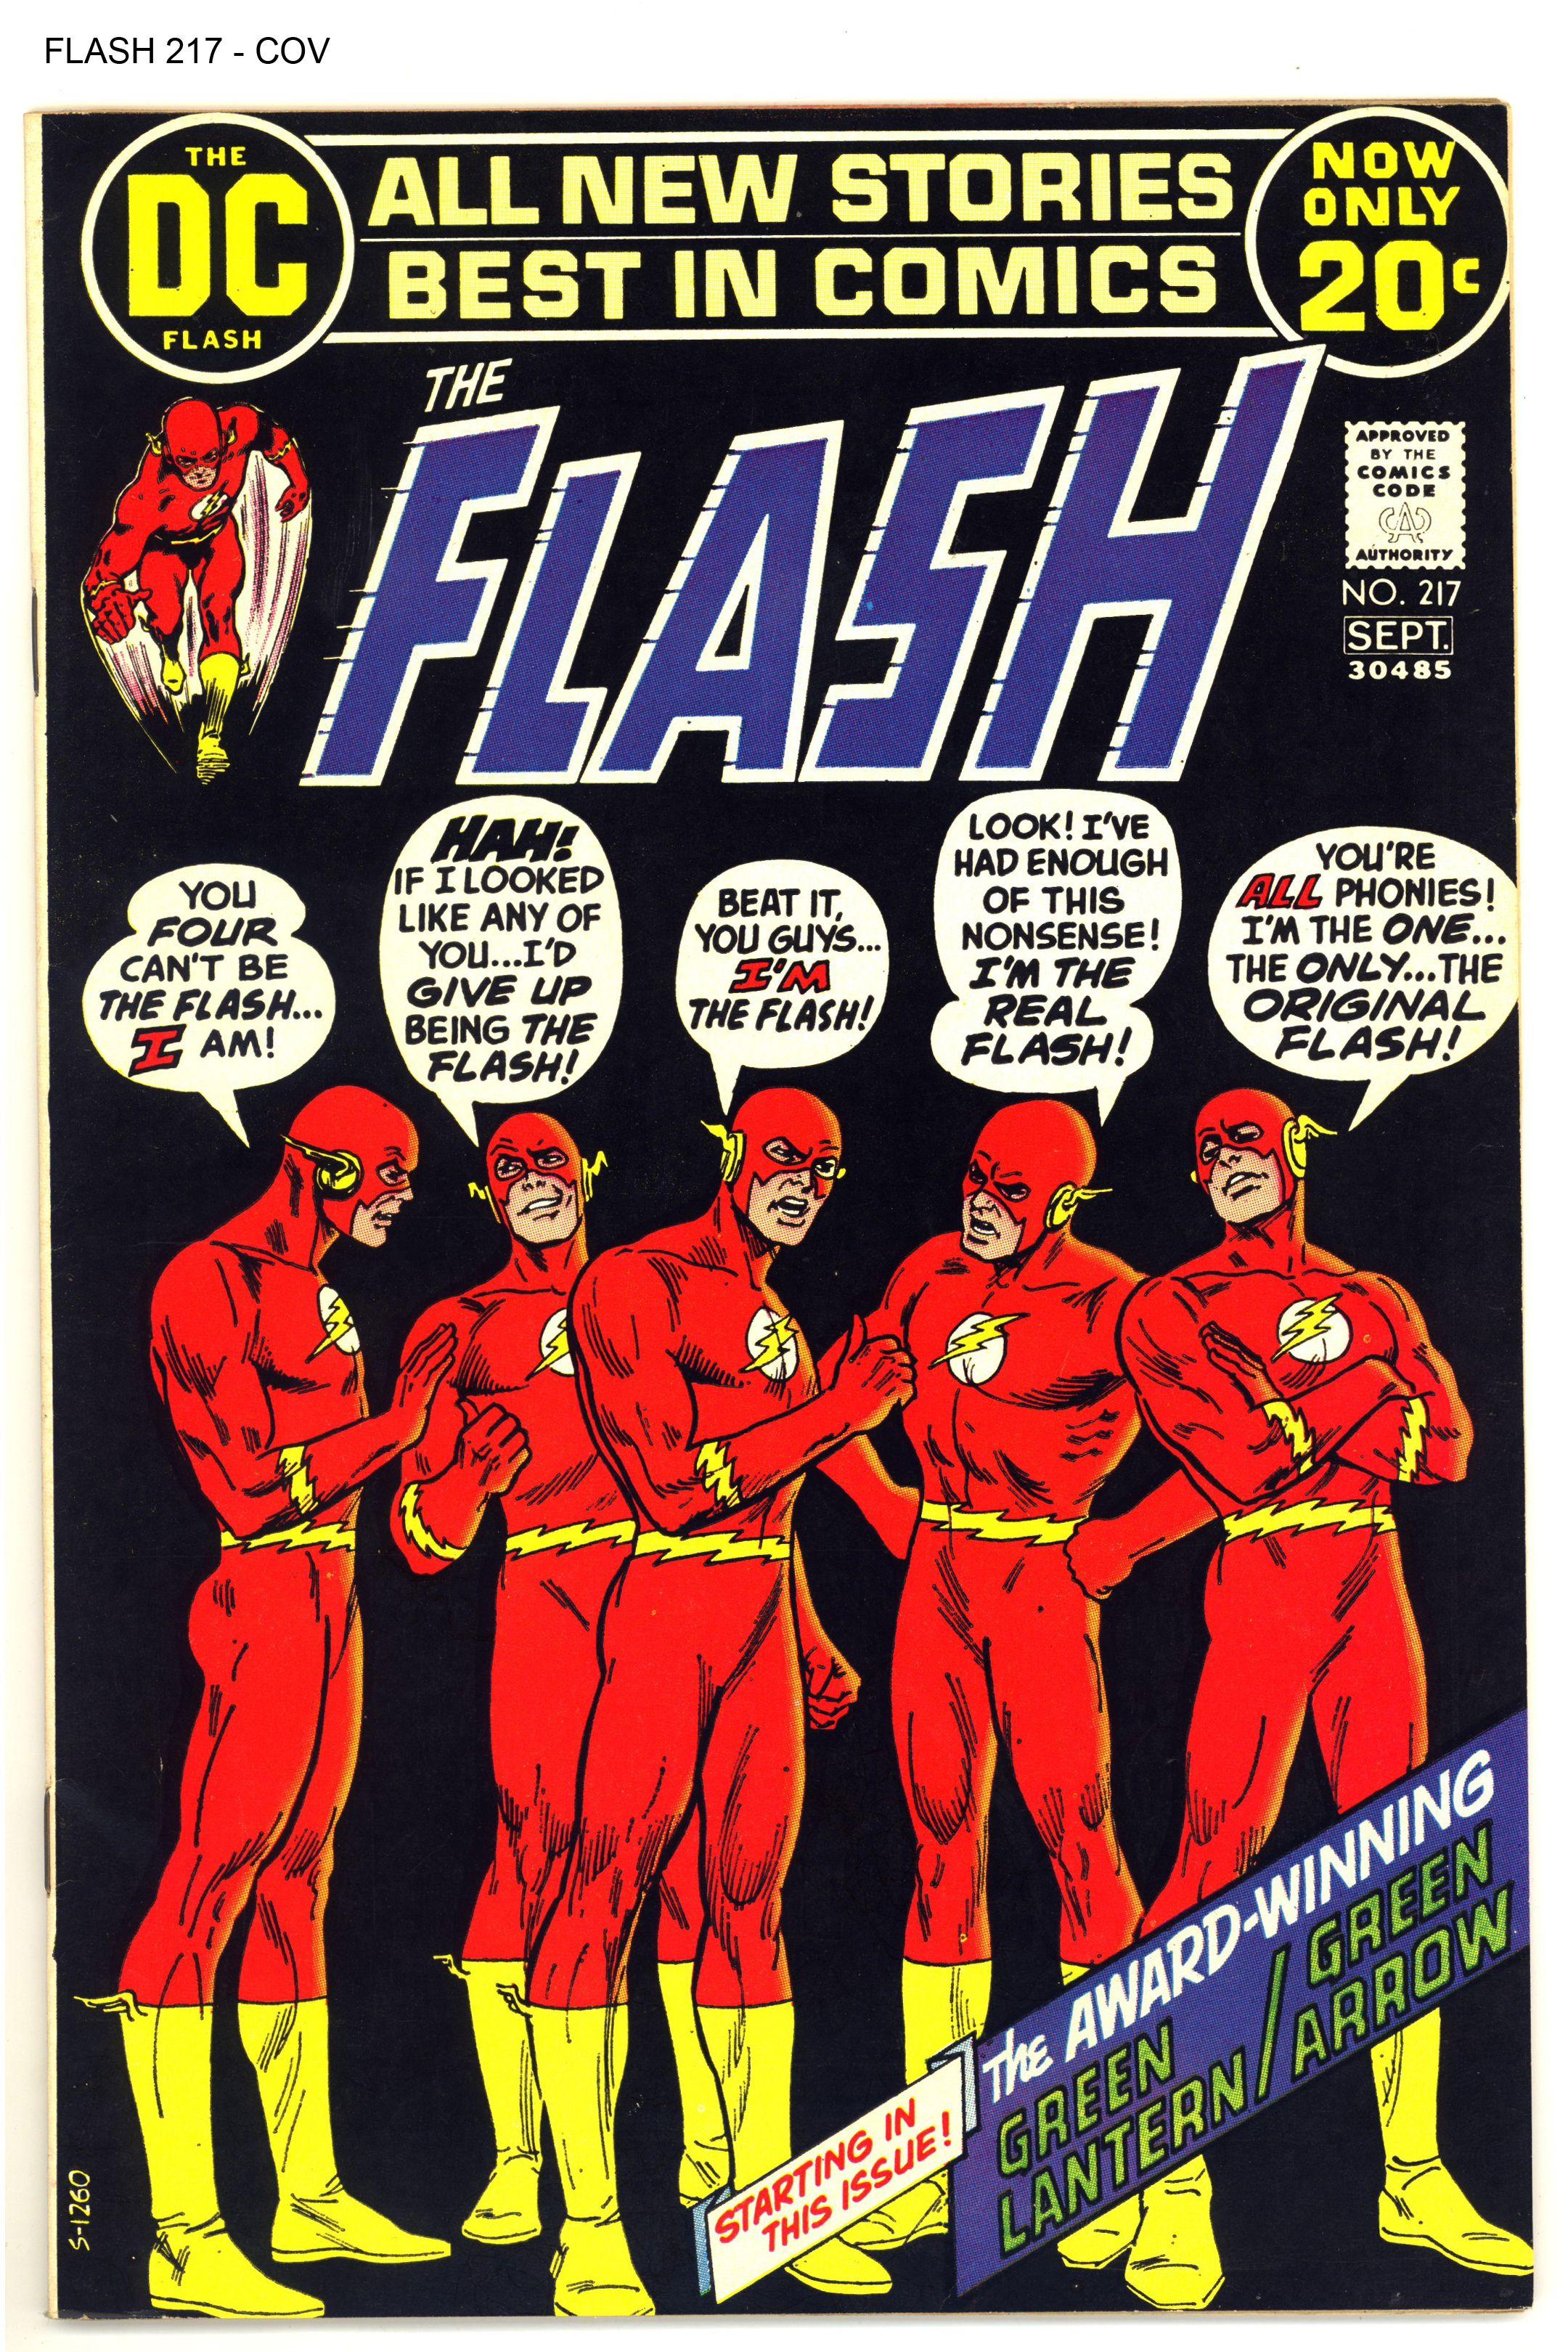 Pin By Hil Mat On The Flash Comic Books Comic Book Covers Dc Comic Books